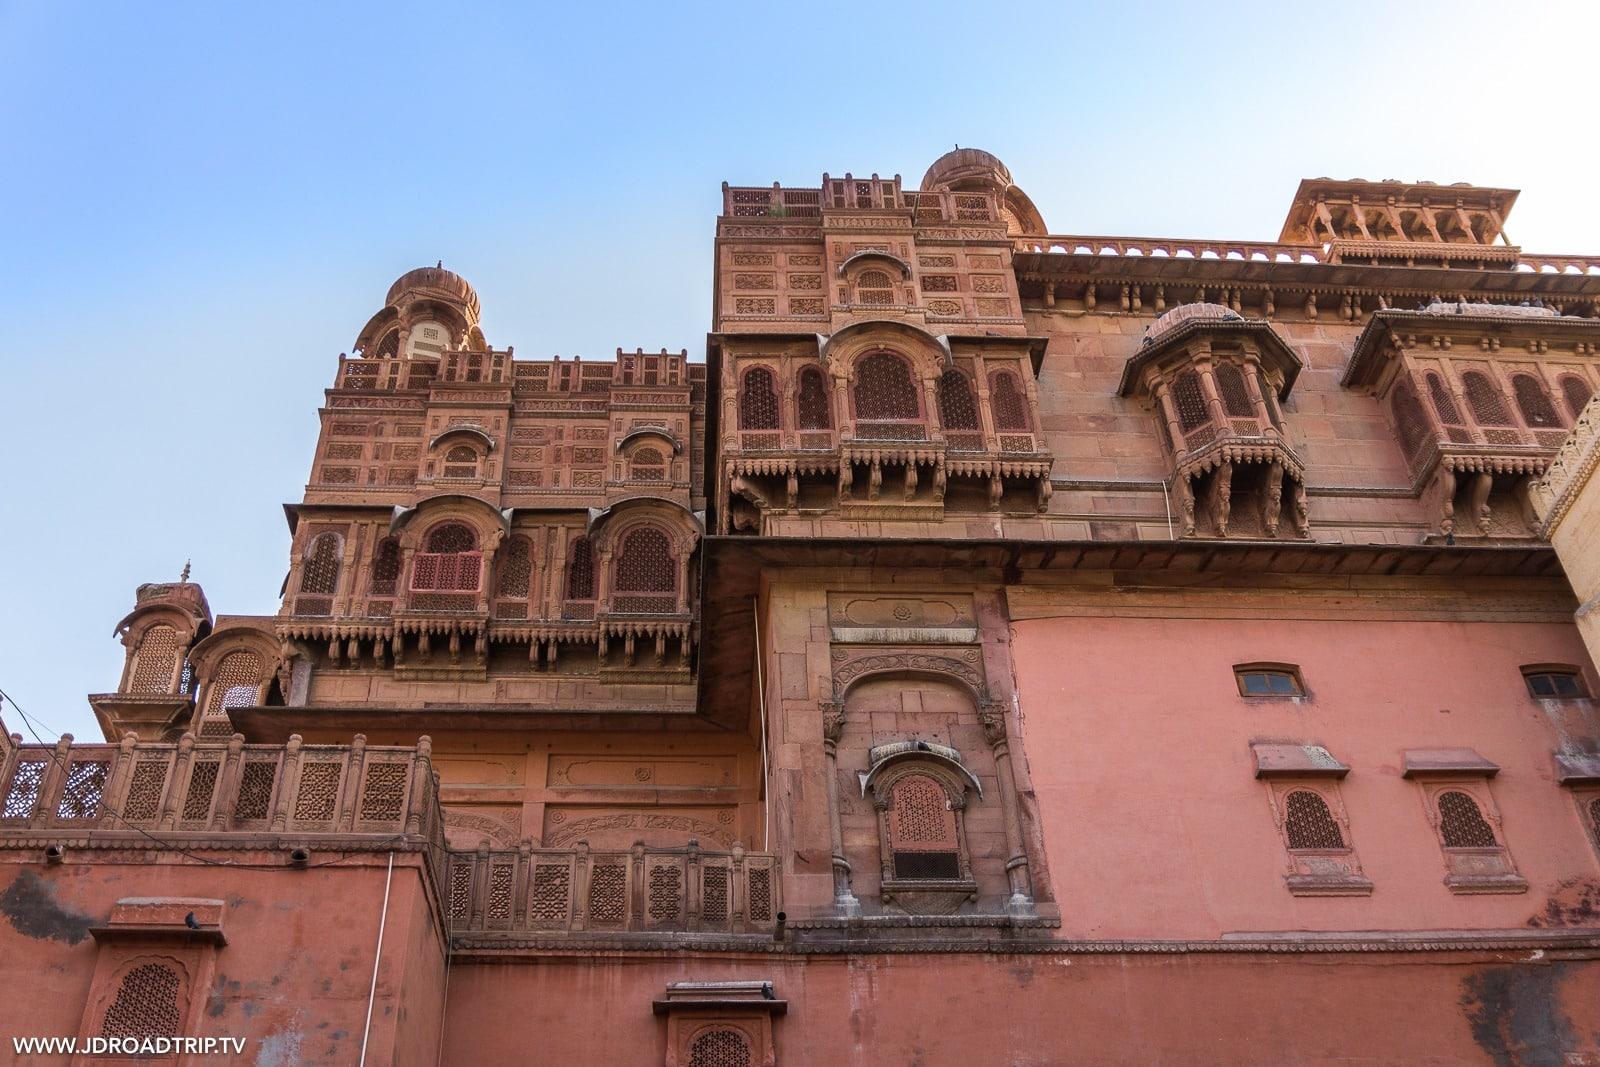 Visiter Bikaner en 2 jours - Fort Junagarh